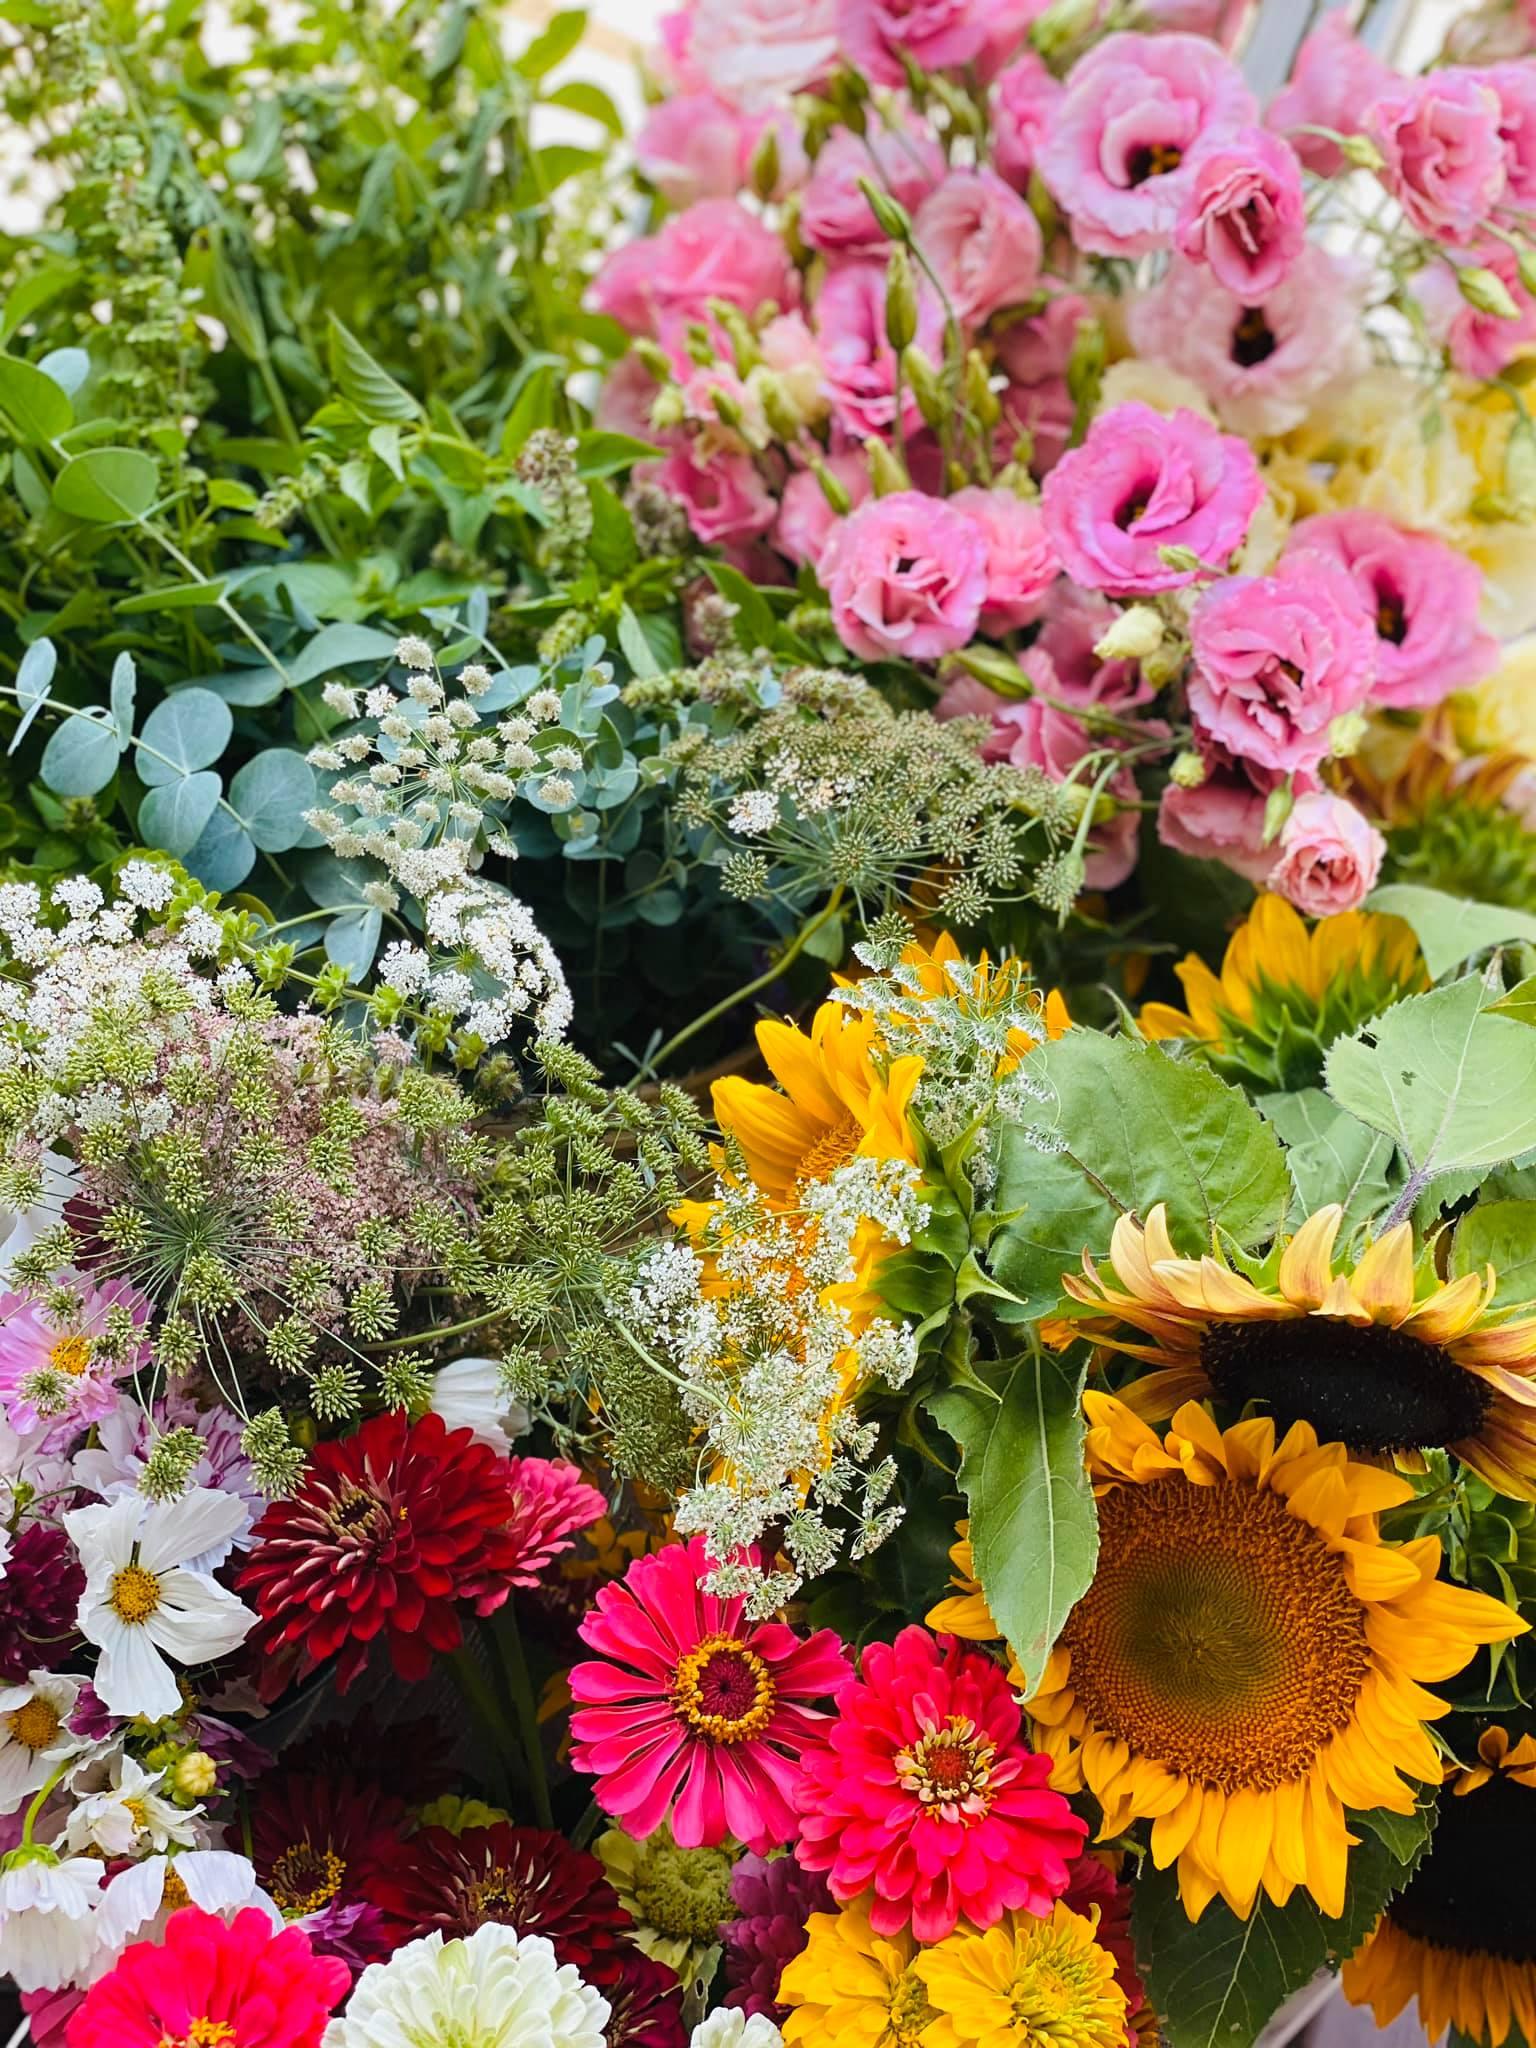 Local, fresh flowers